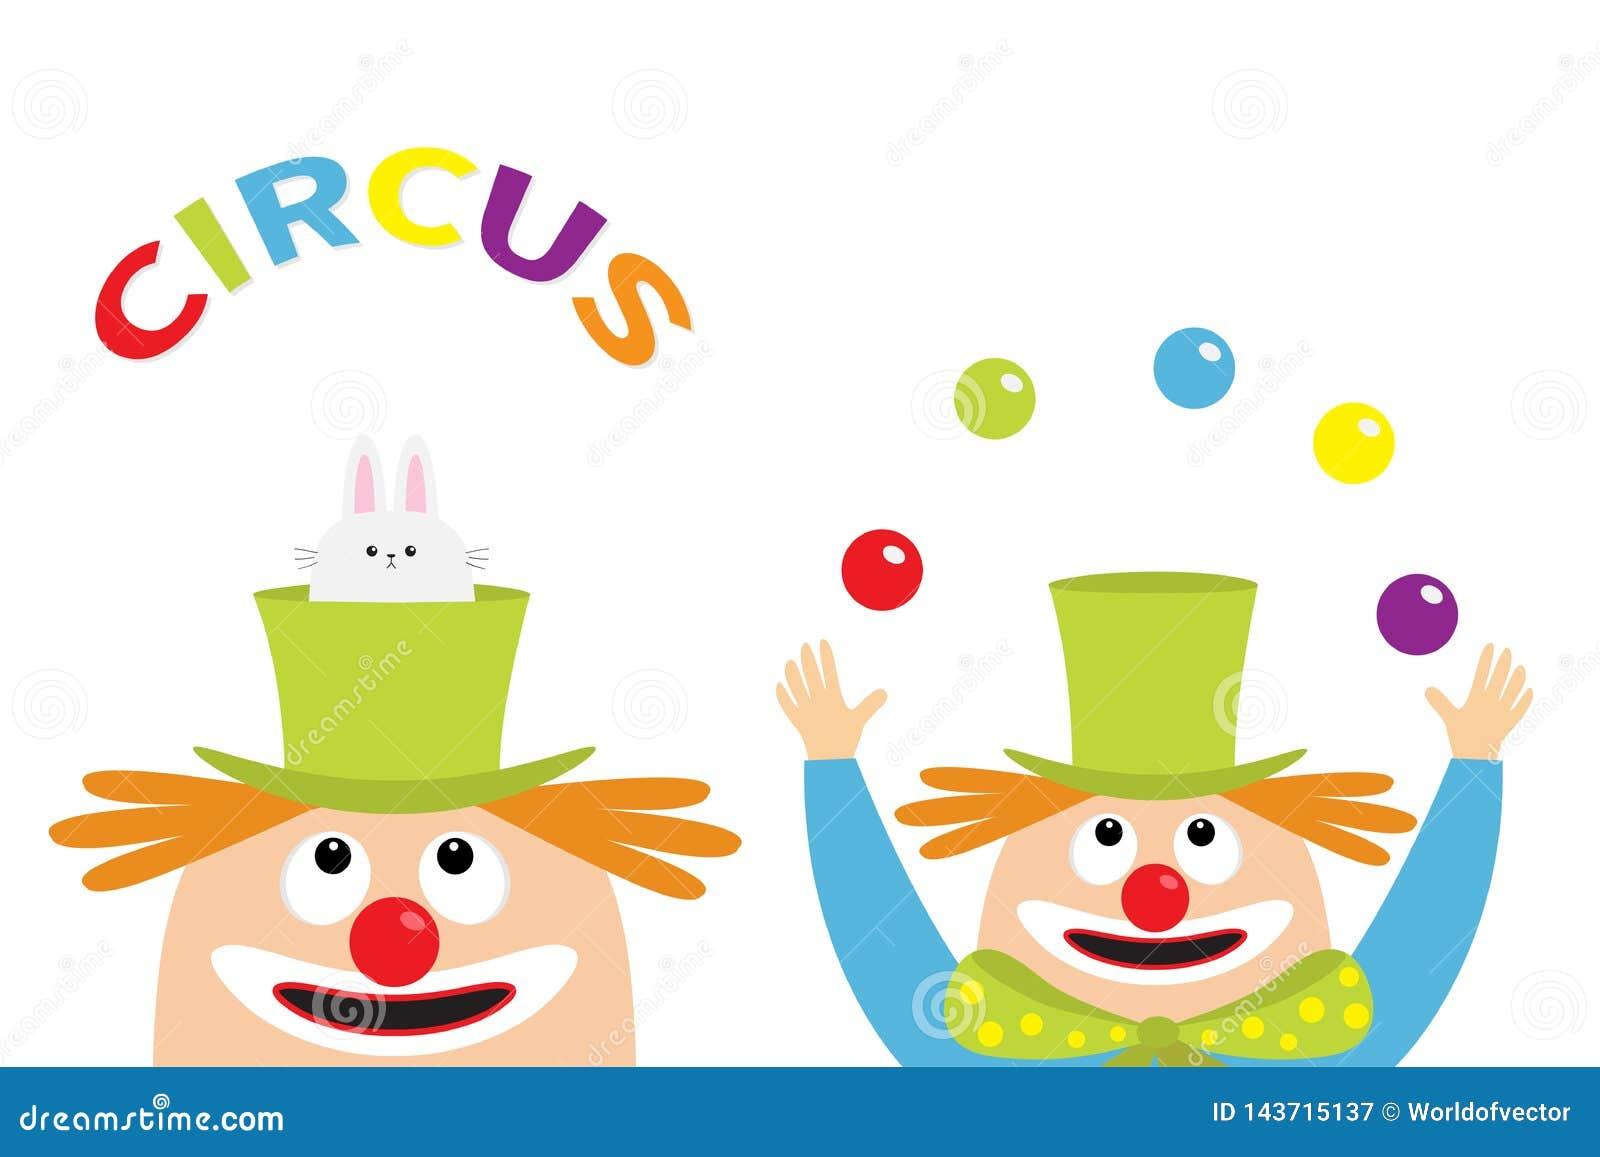 Ensemble D Ic Ne De Cirque Tete De Visage De Jongleur De Clown